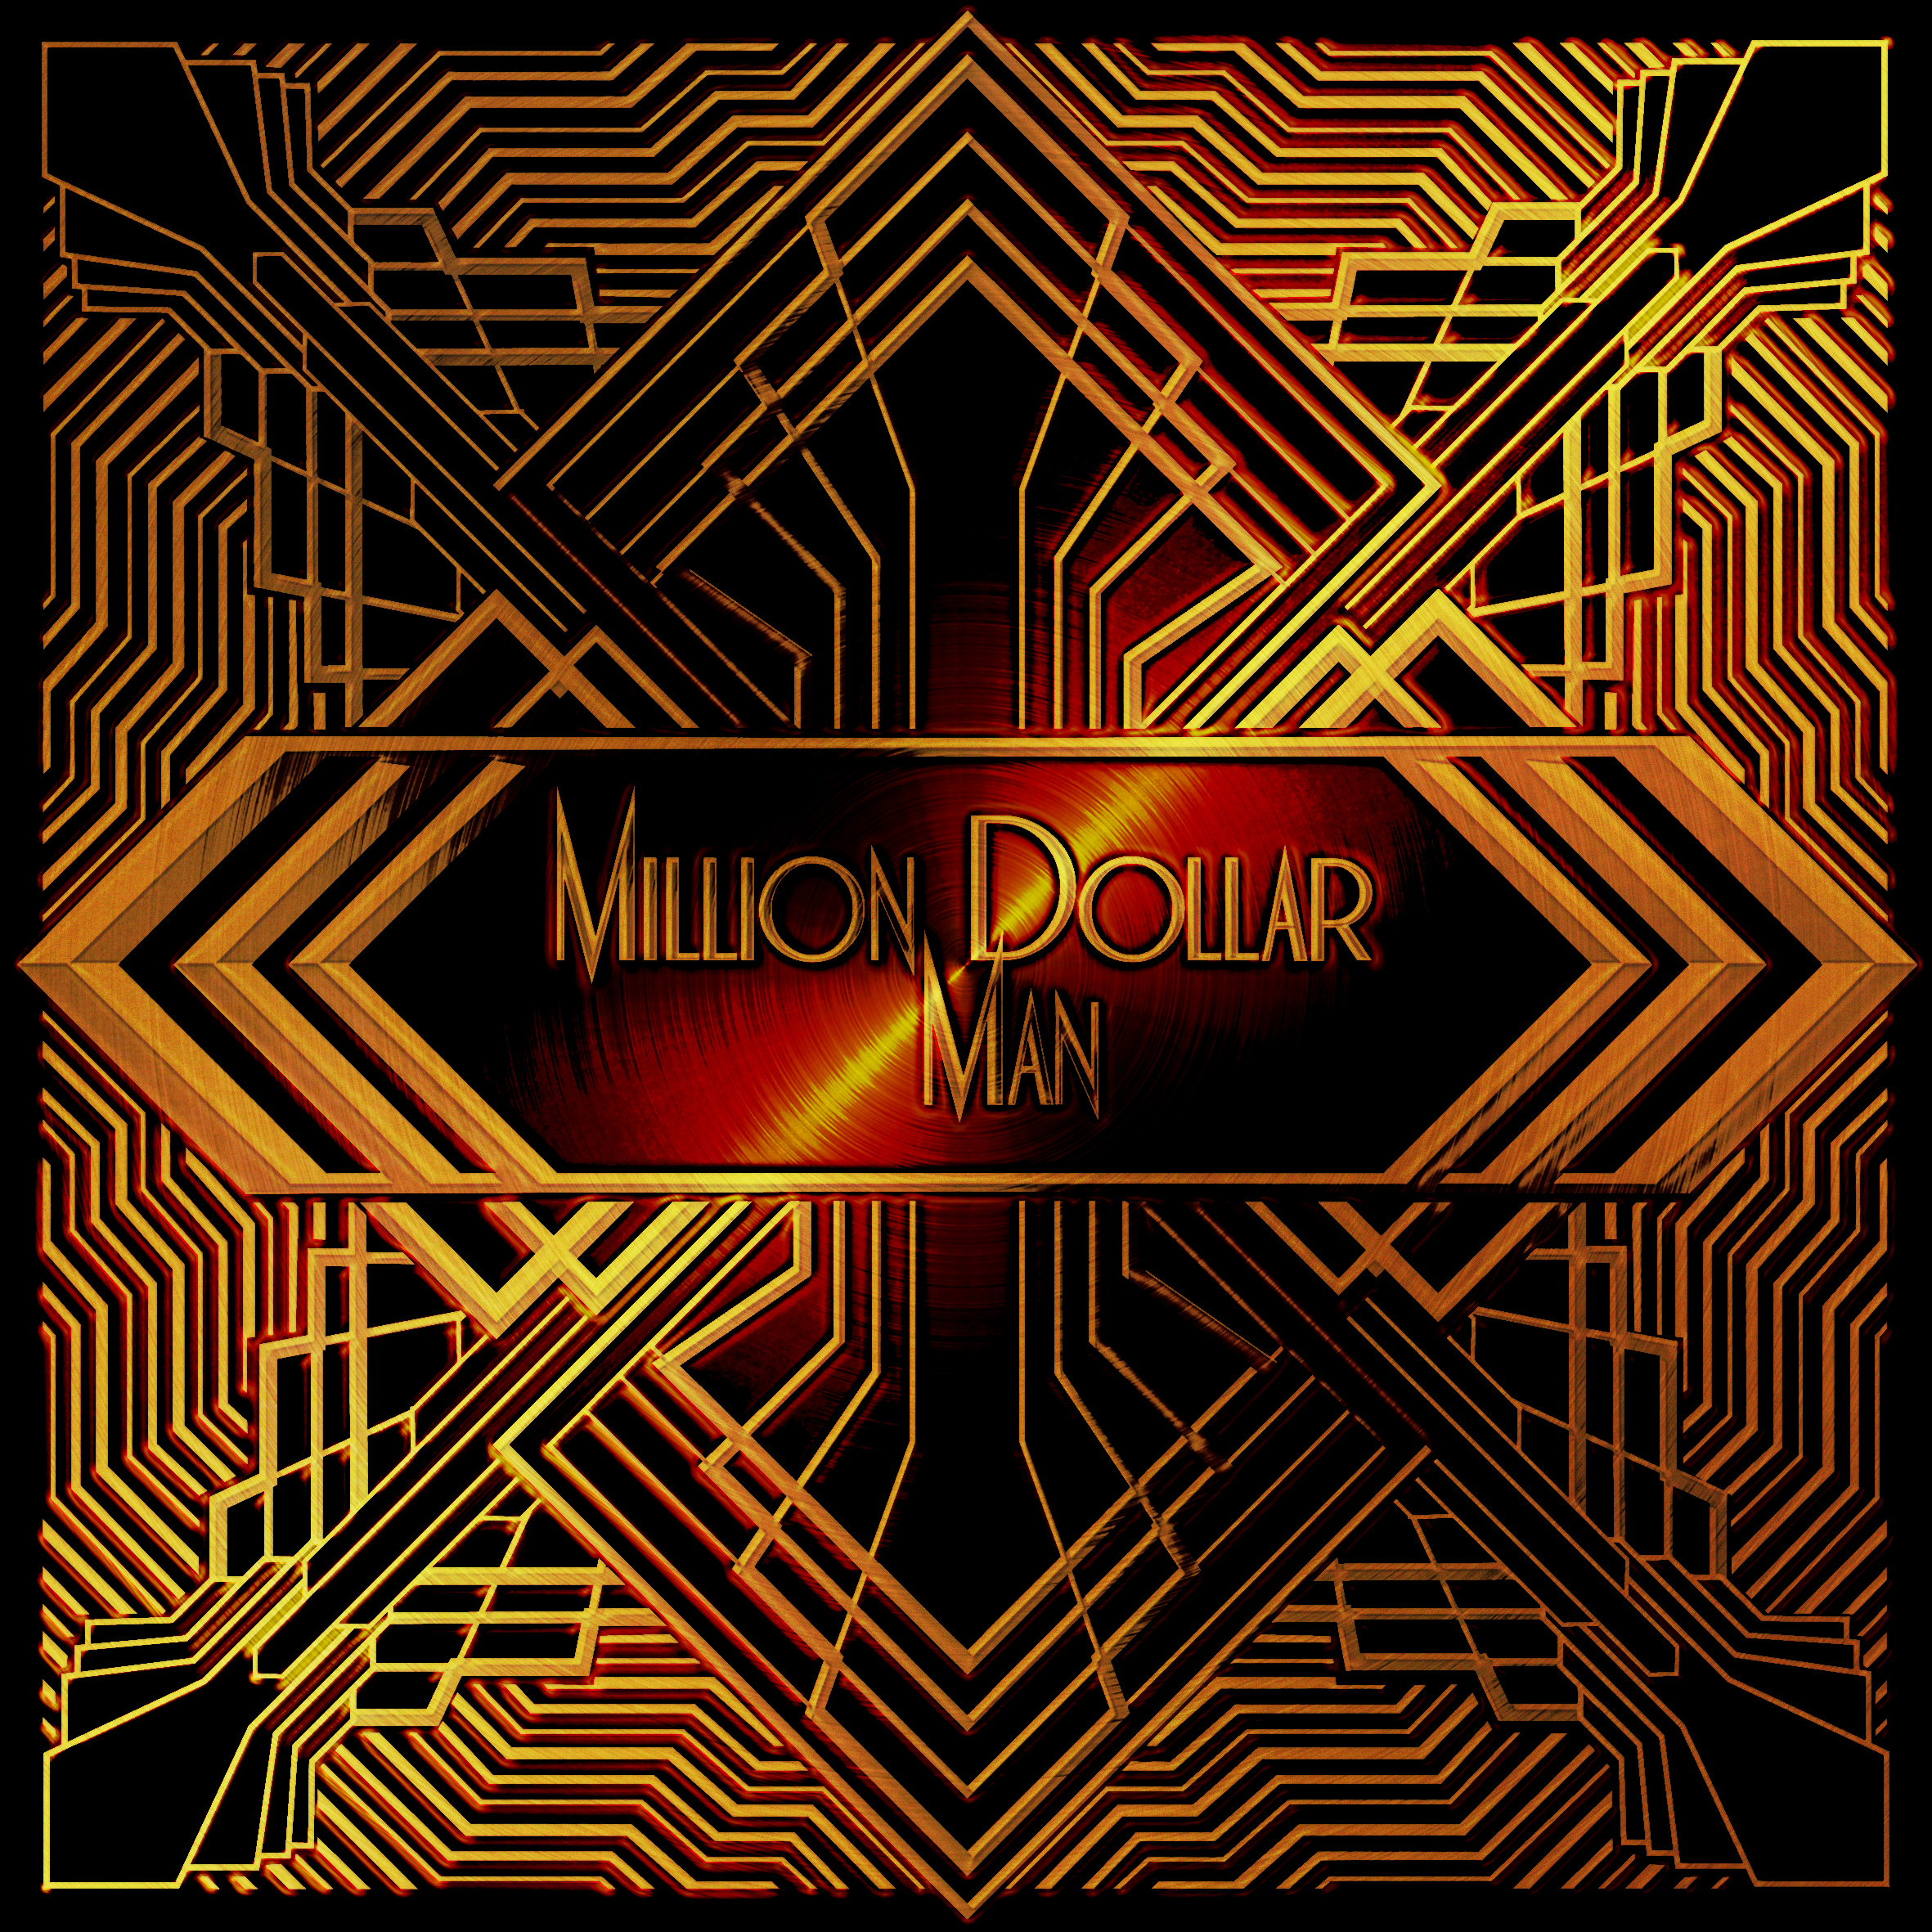 Avalanche Party - Million Dollar Man